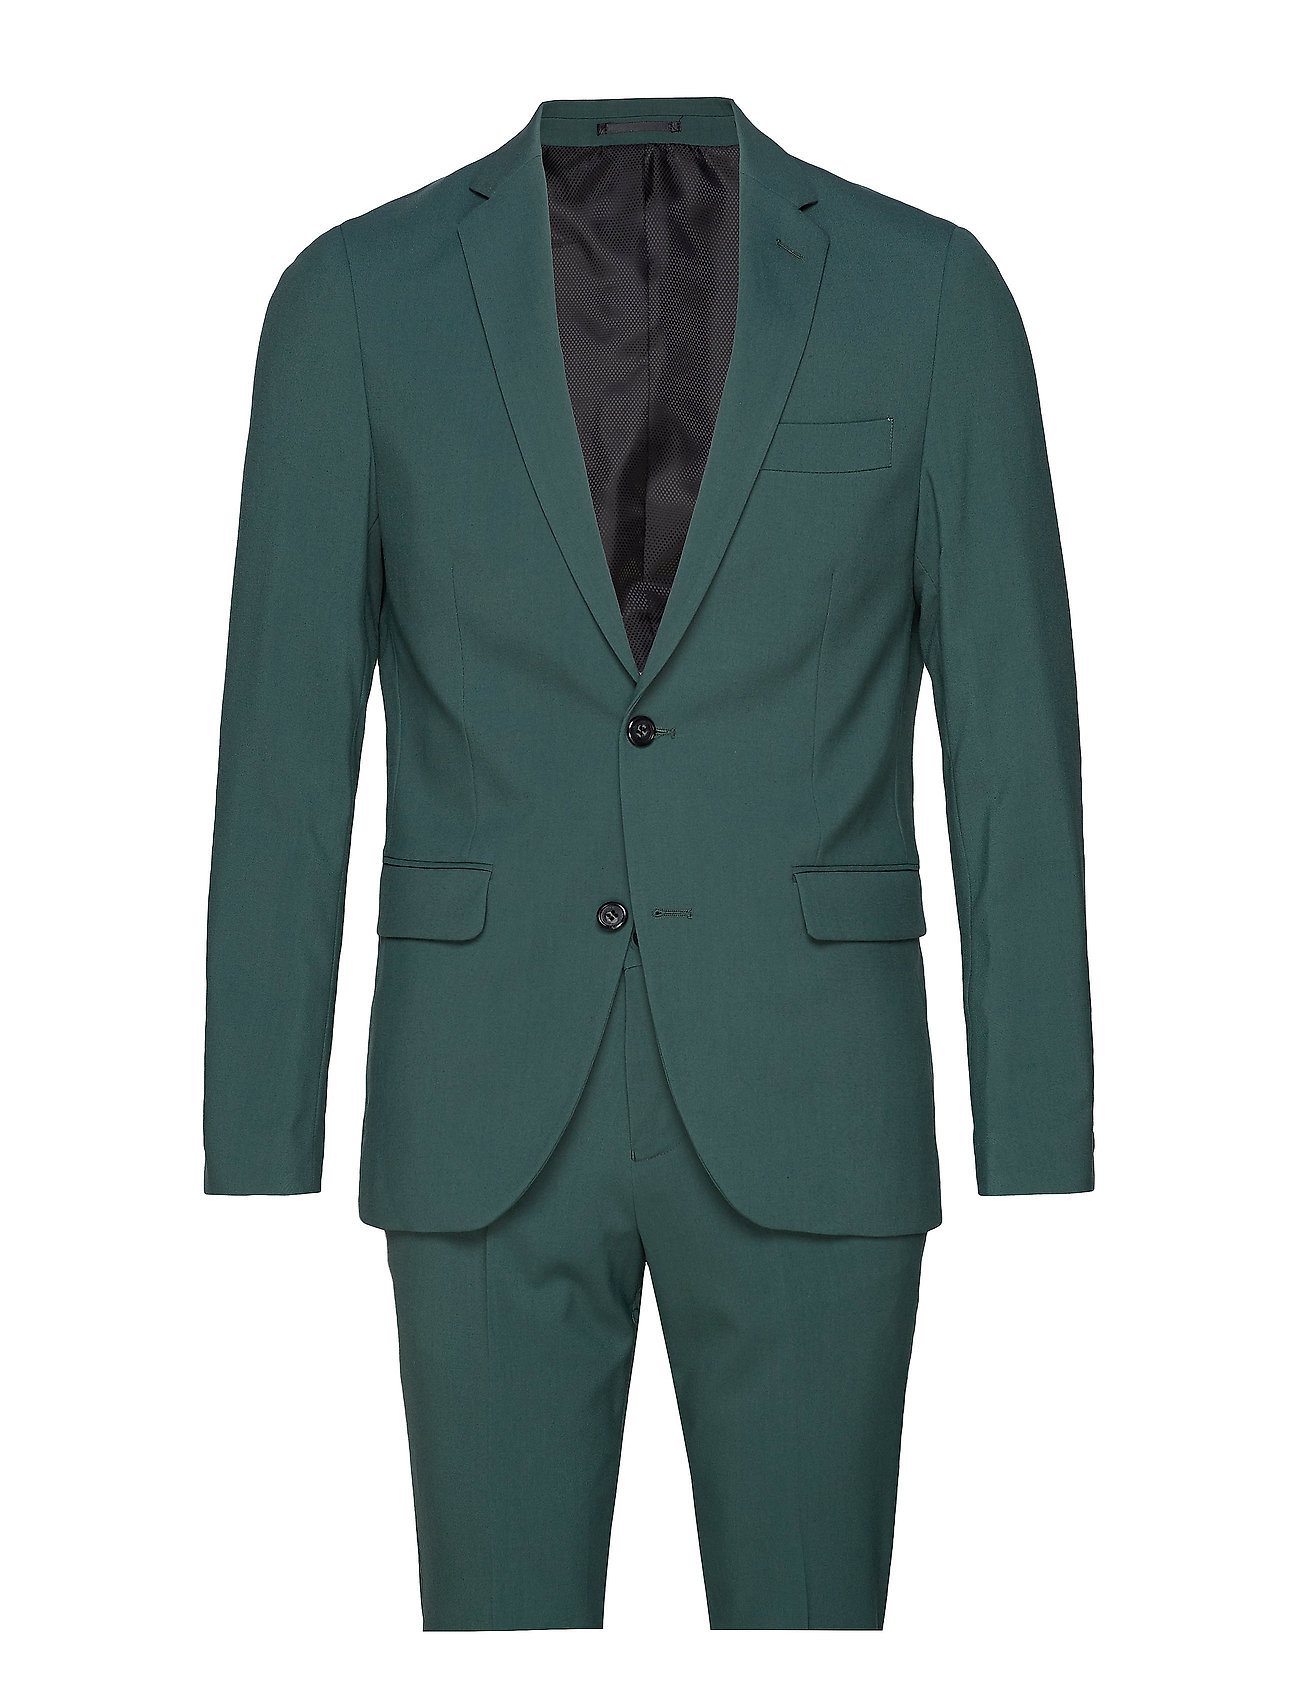 Lindbergh Plain mens suit - DEEP GREEN